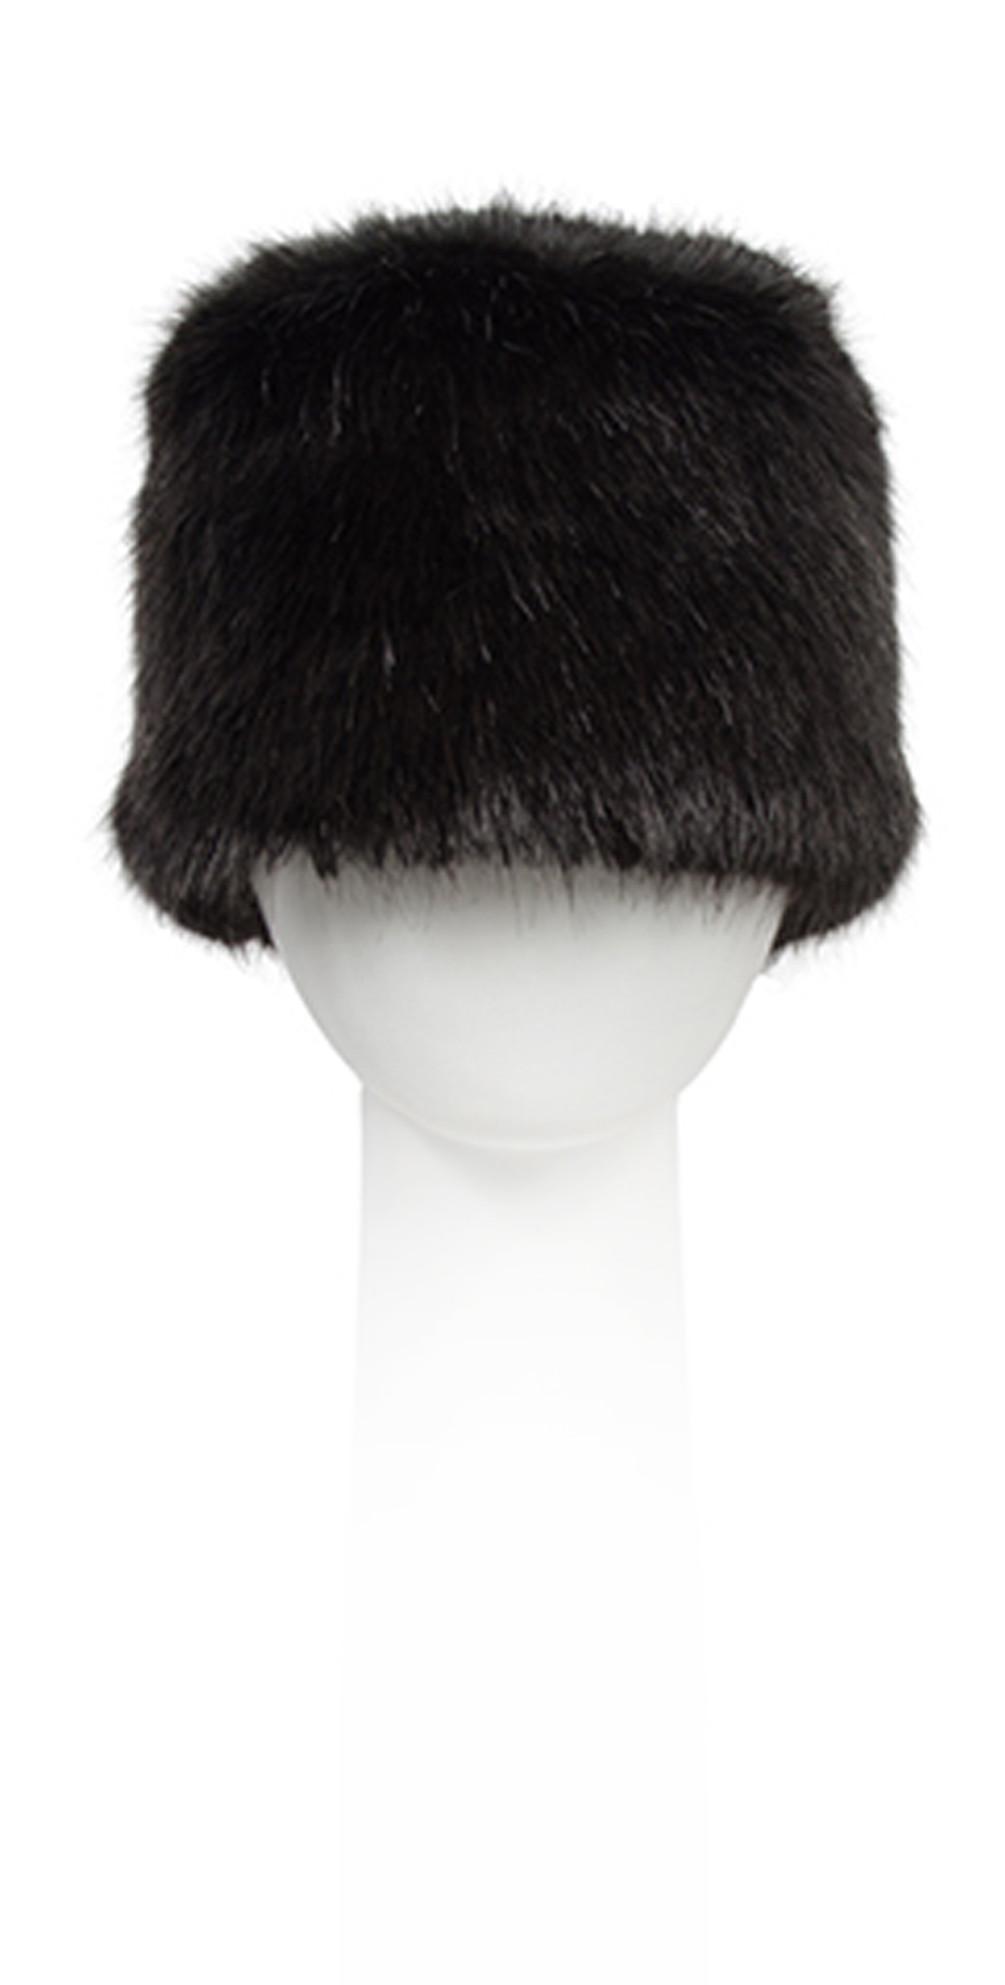 Pia Rossini Monroe Faux Fur Russian Hat in Black cf92d9df624